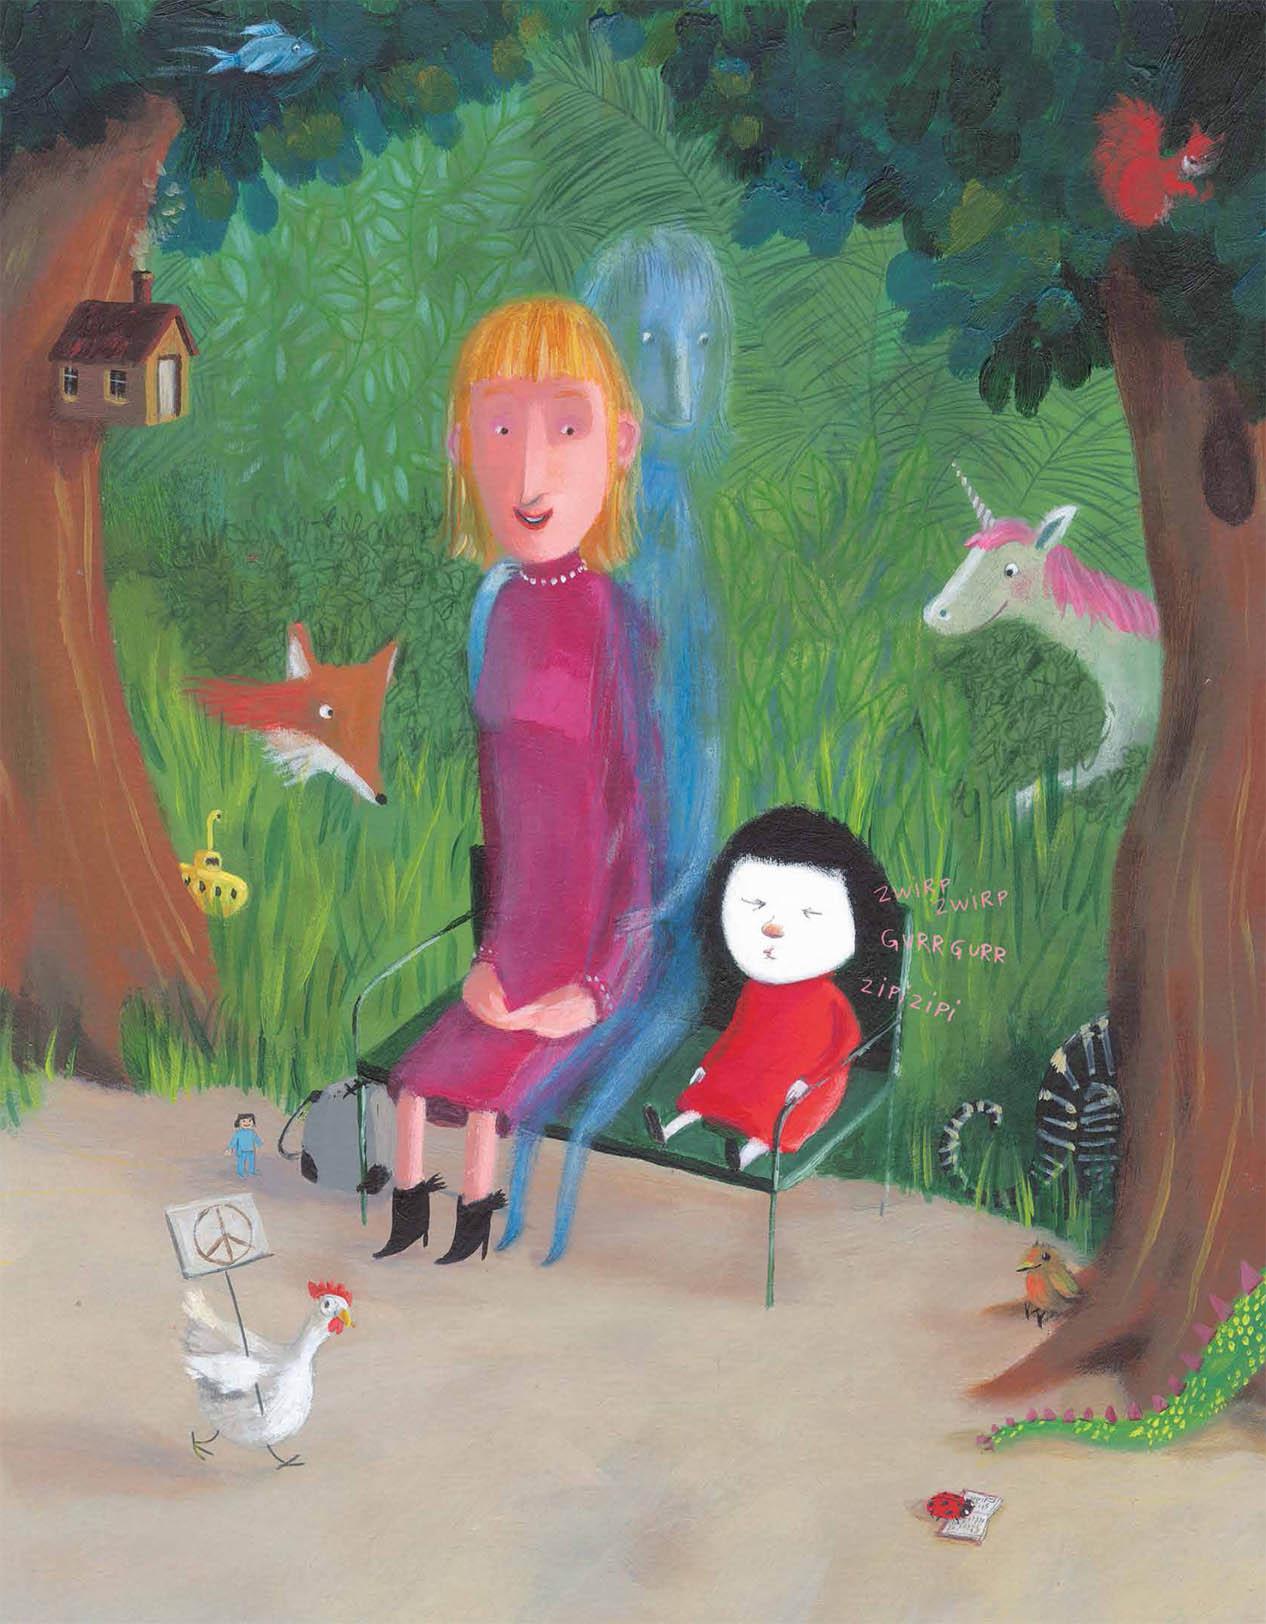 childrens book Ueberreuter Verlag 2018